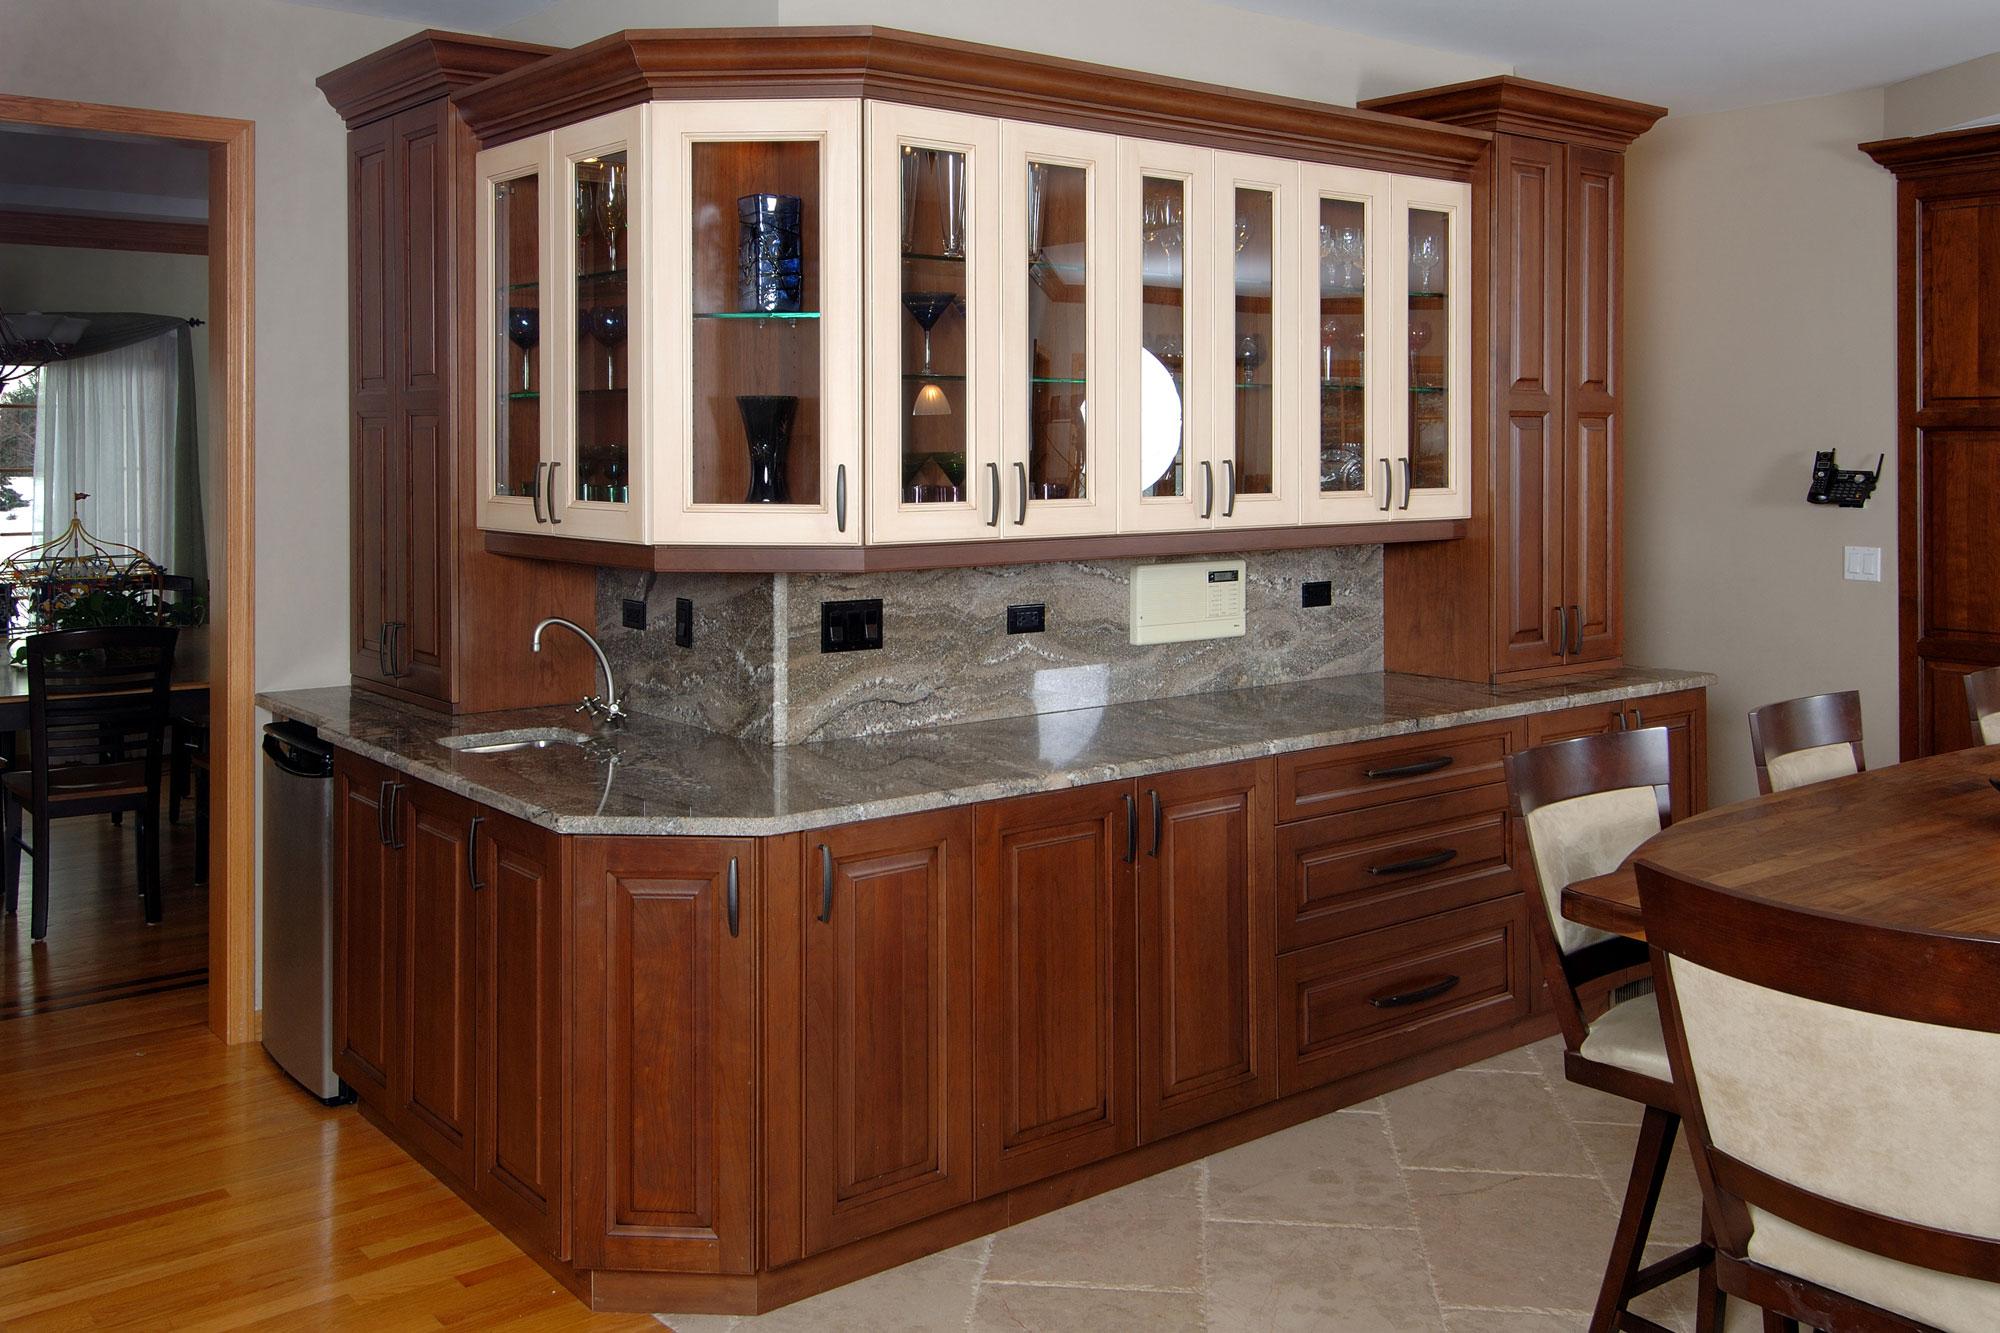 Kitchen cabinets lake zurich il - Cherry Custom Kitchen Cabinets Closeup